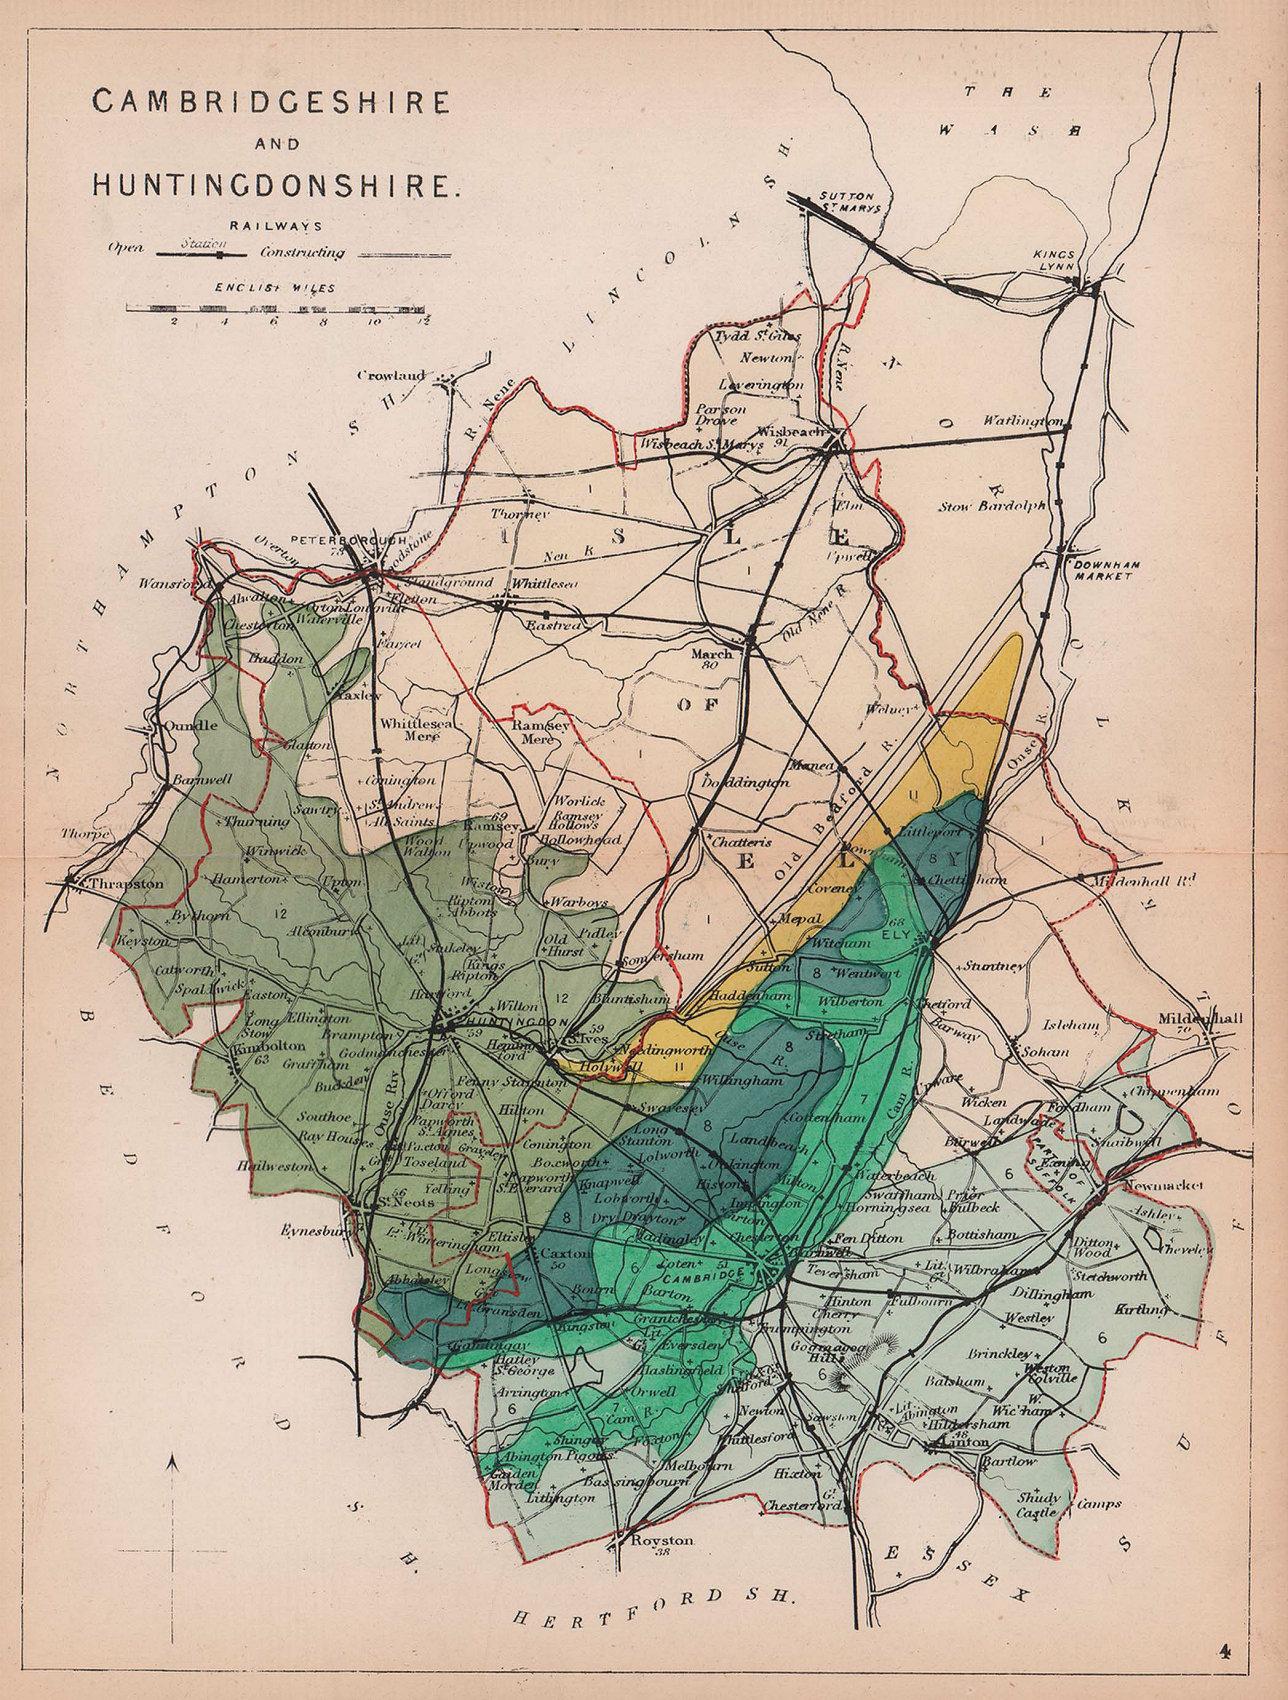 CAMBRIDGESHIRE & HUNTINGDONSHIRE antique geological county map. REYNOLDS 1864